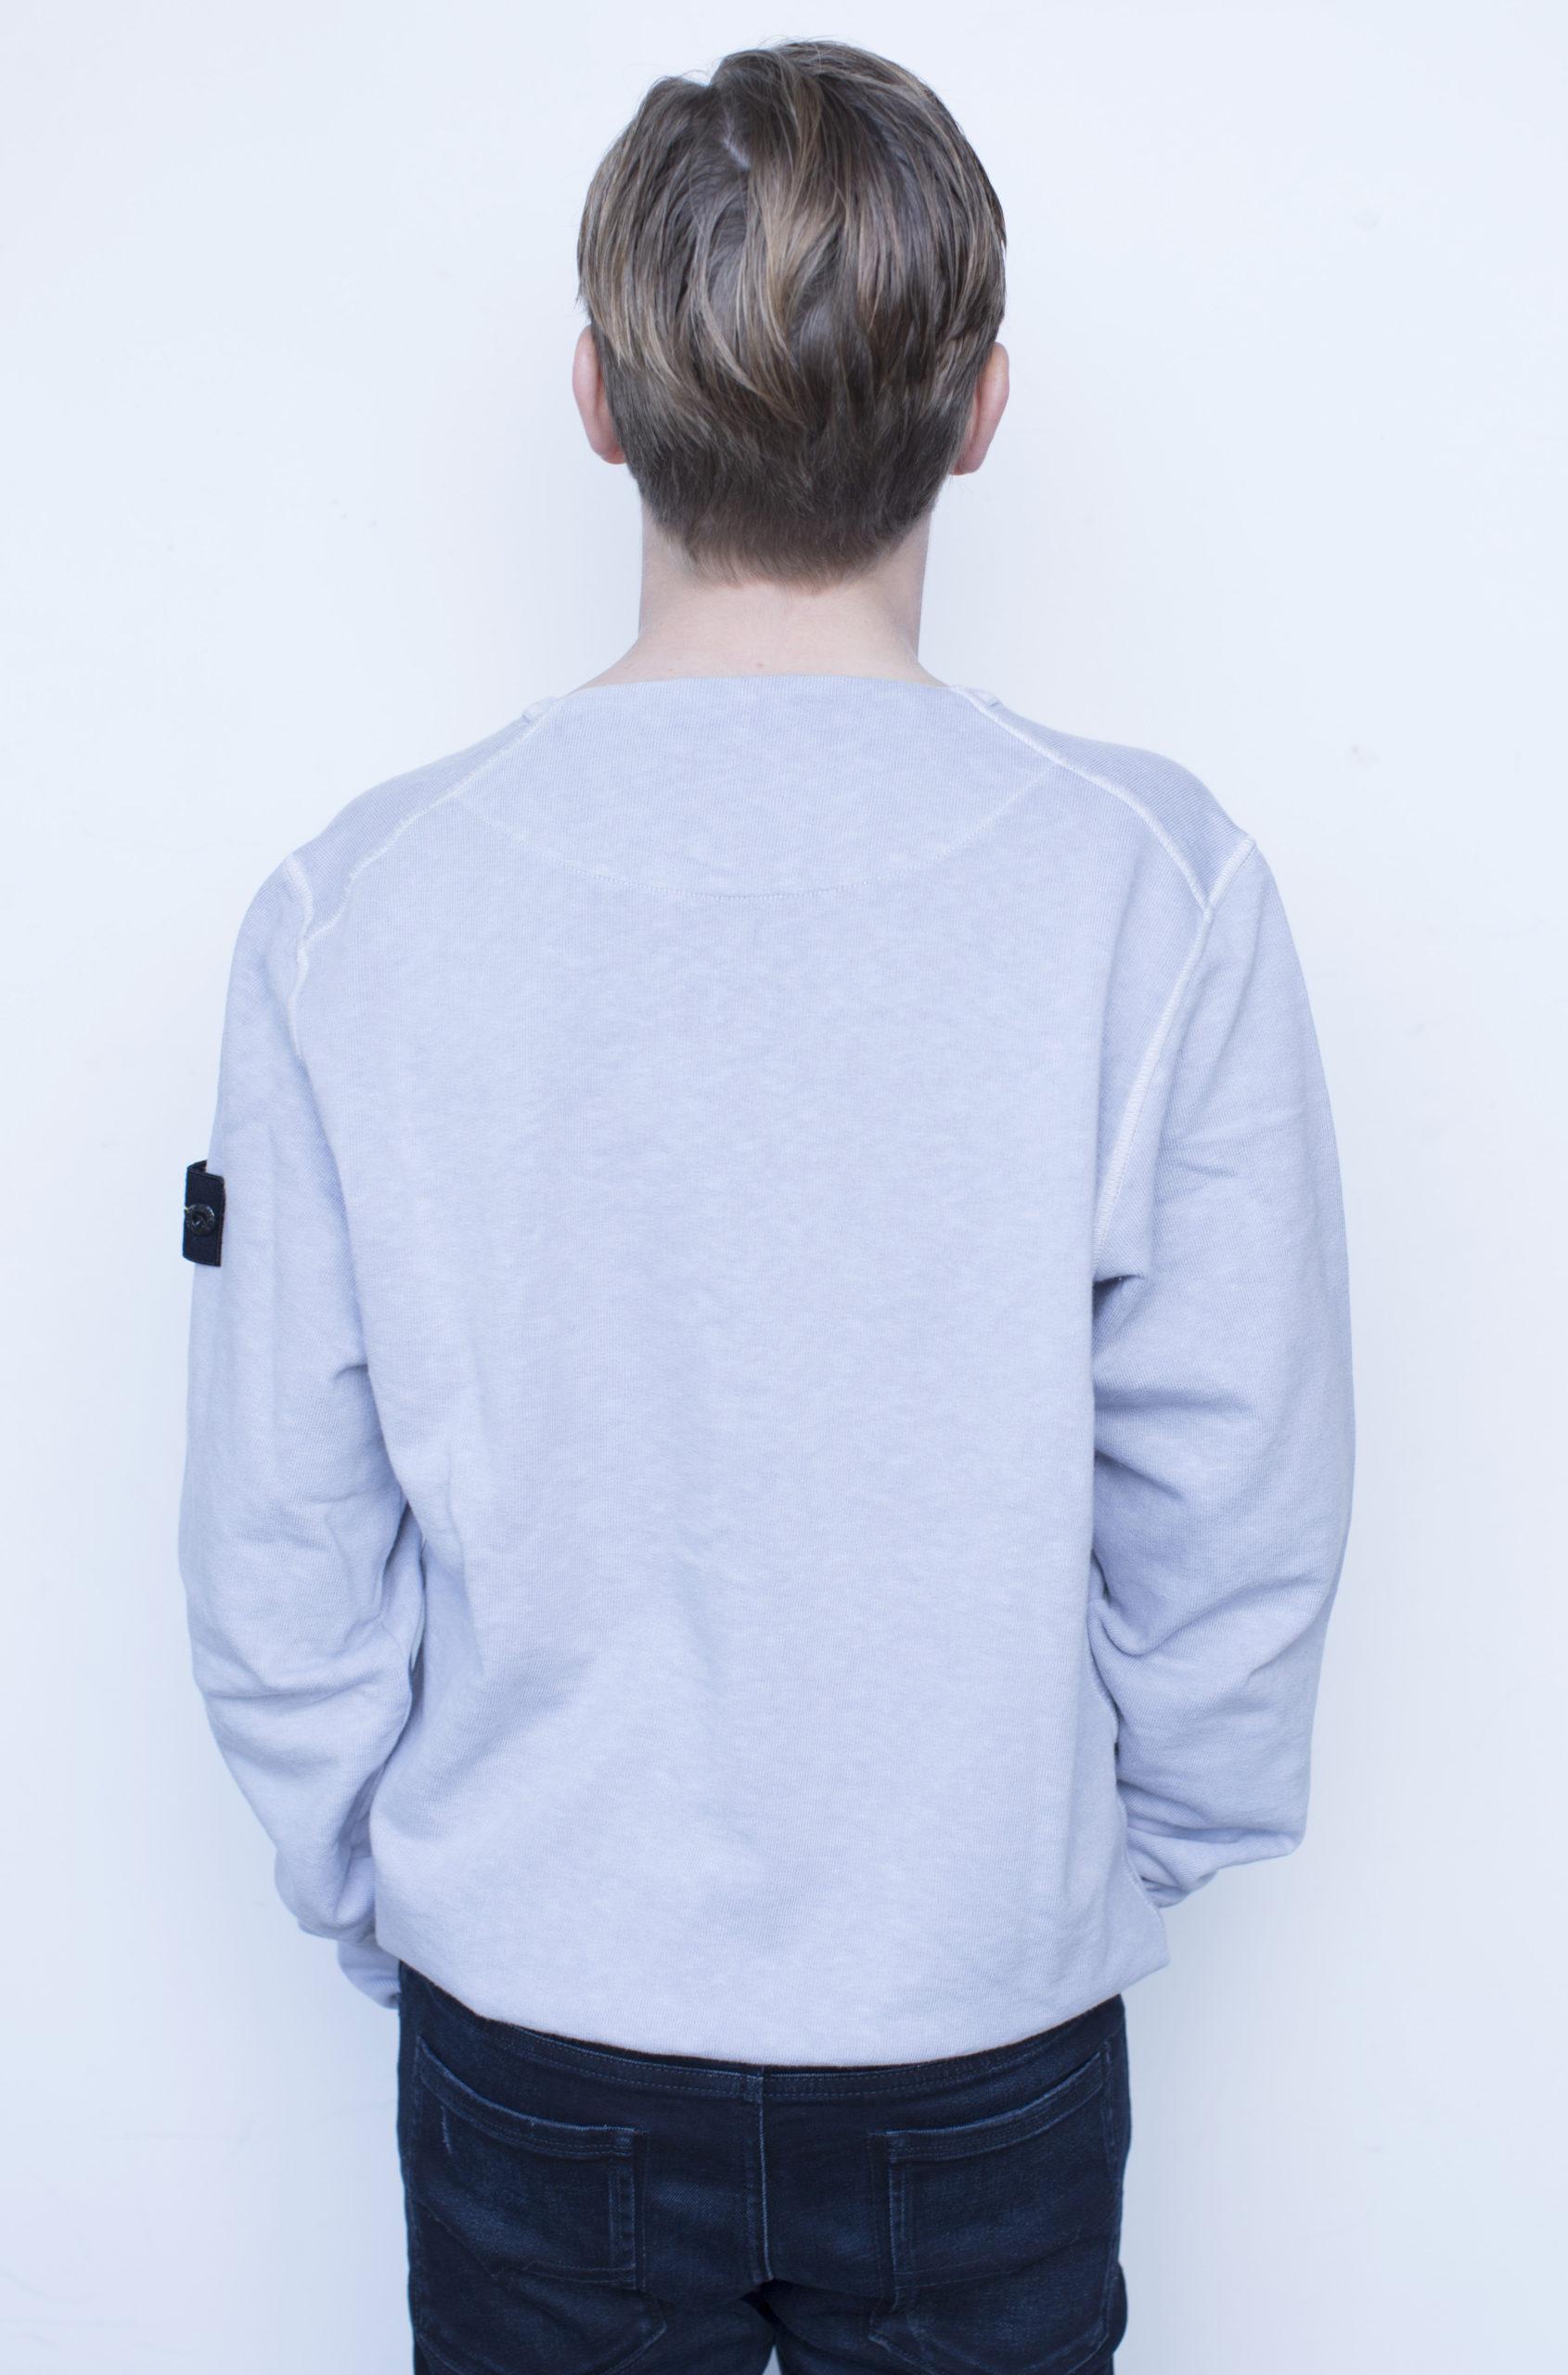 Stone Island sweater logo